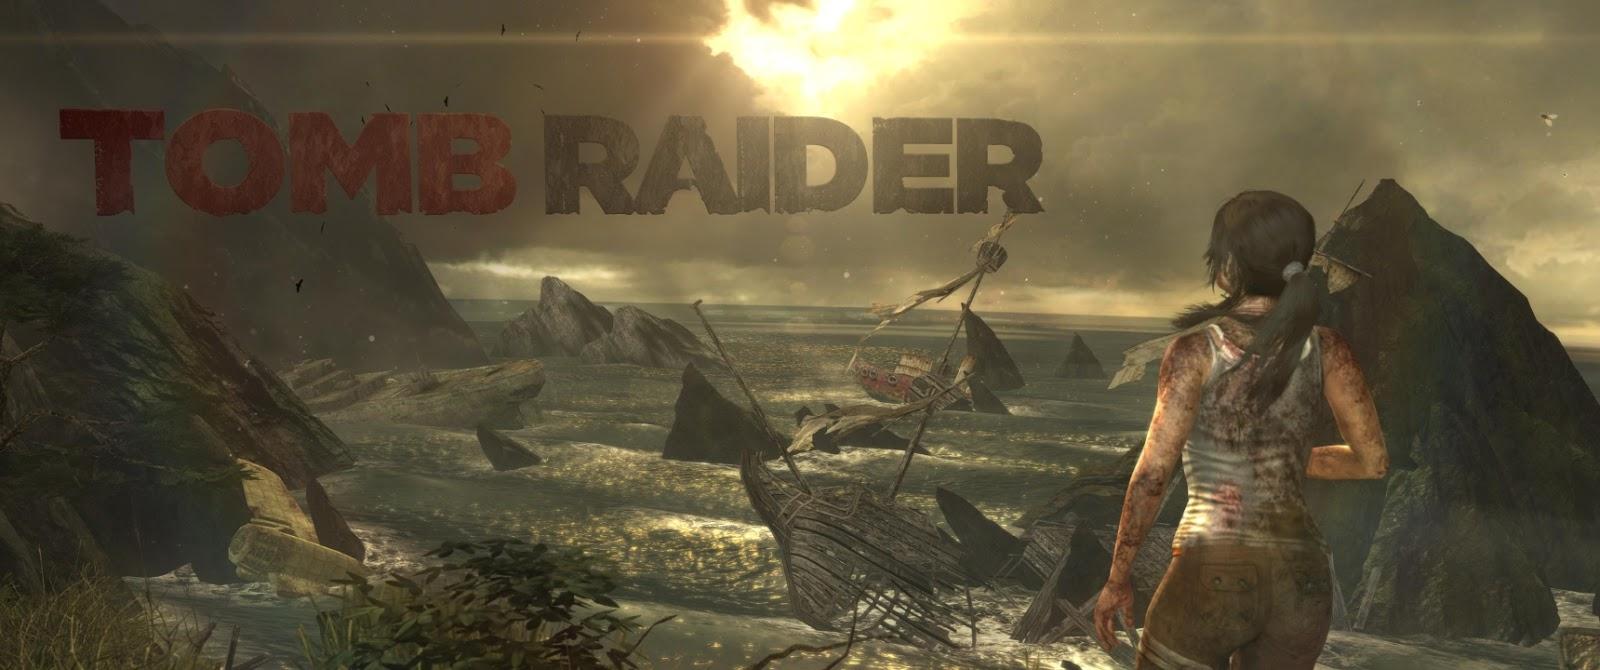 My Blog Tomb Raider 2013 Pc Review